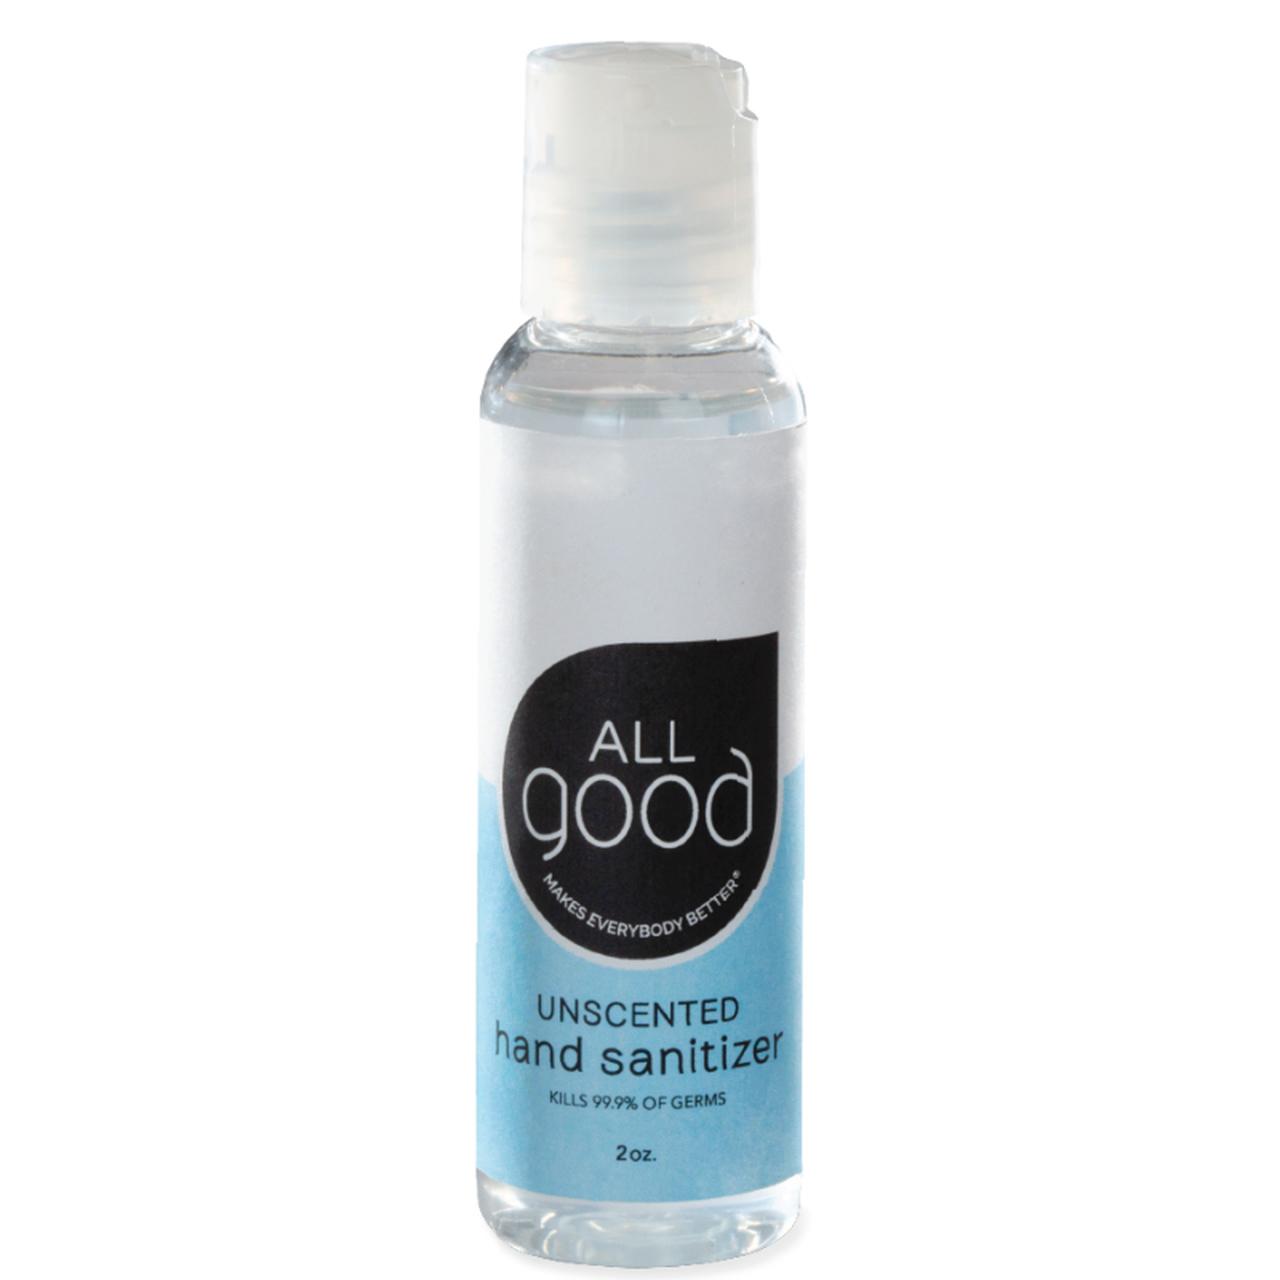 All Good Hand Sanitizer Gel Gimme the good stuff